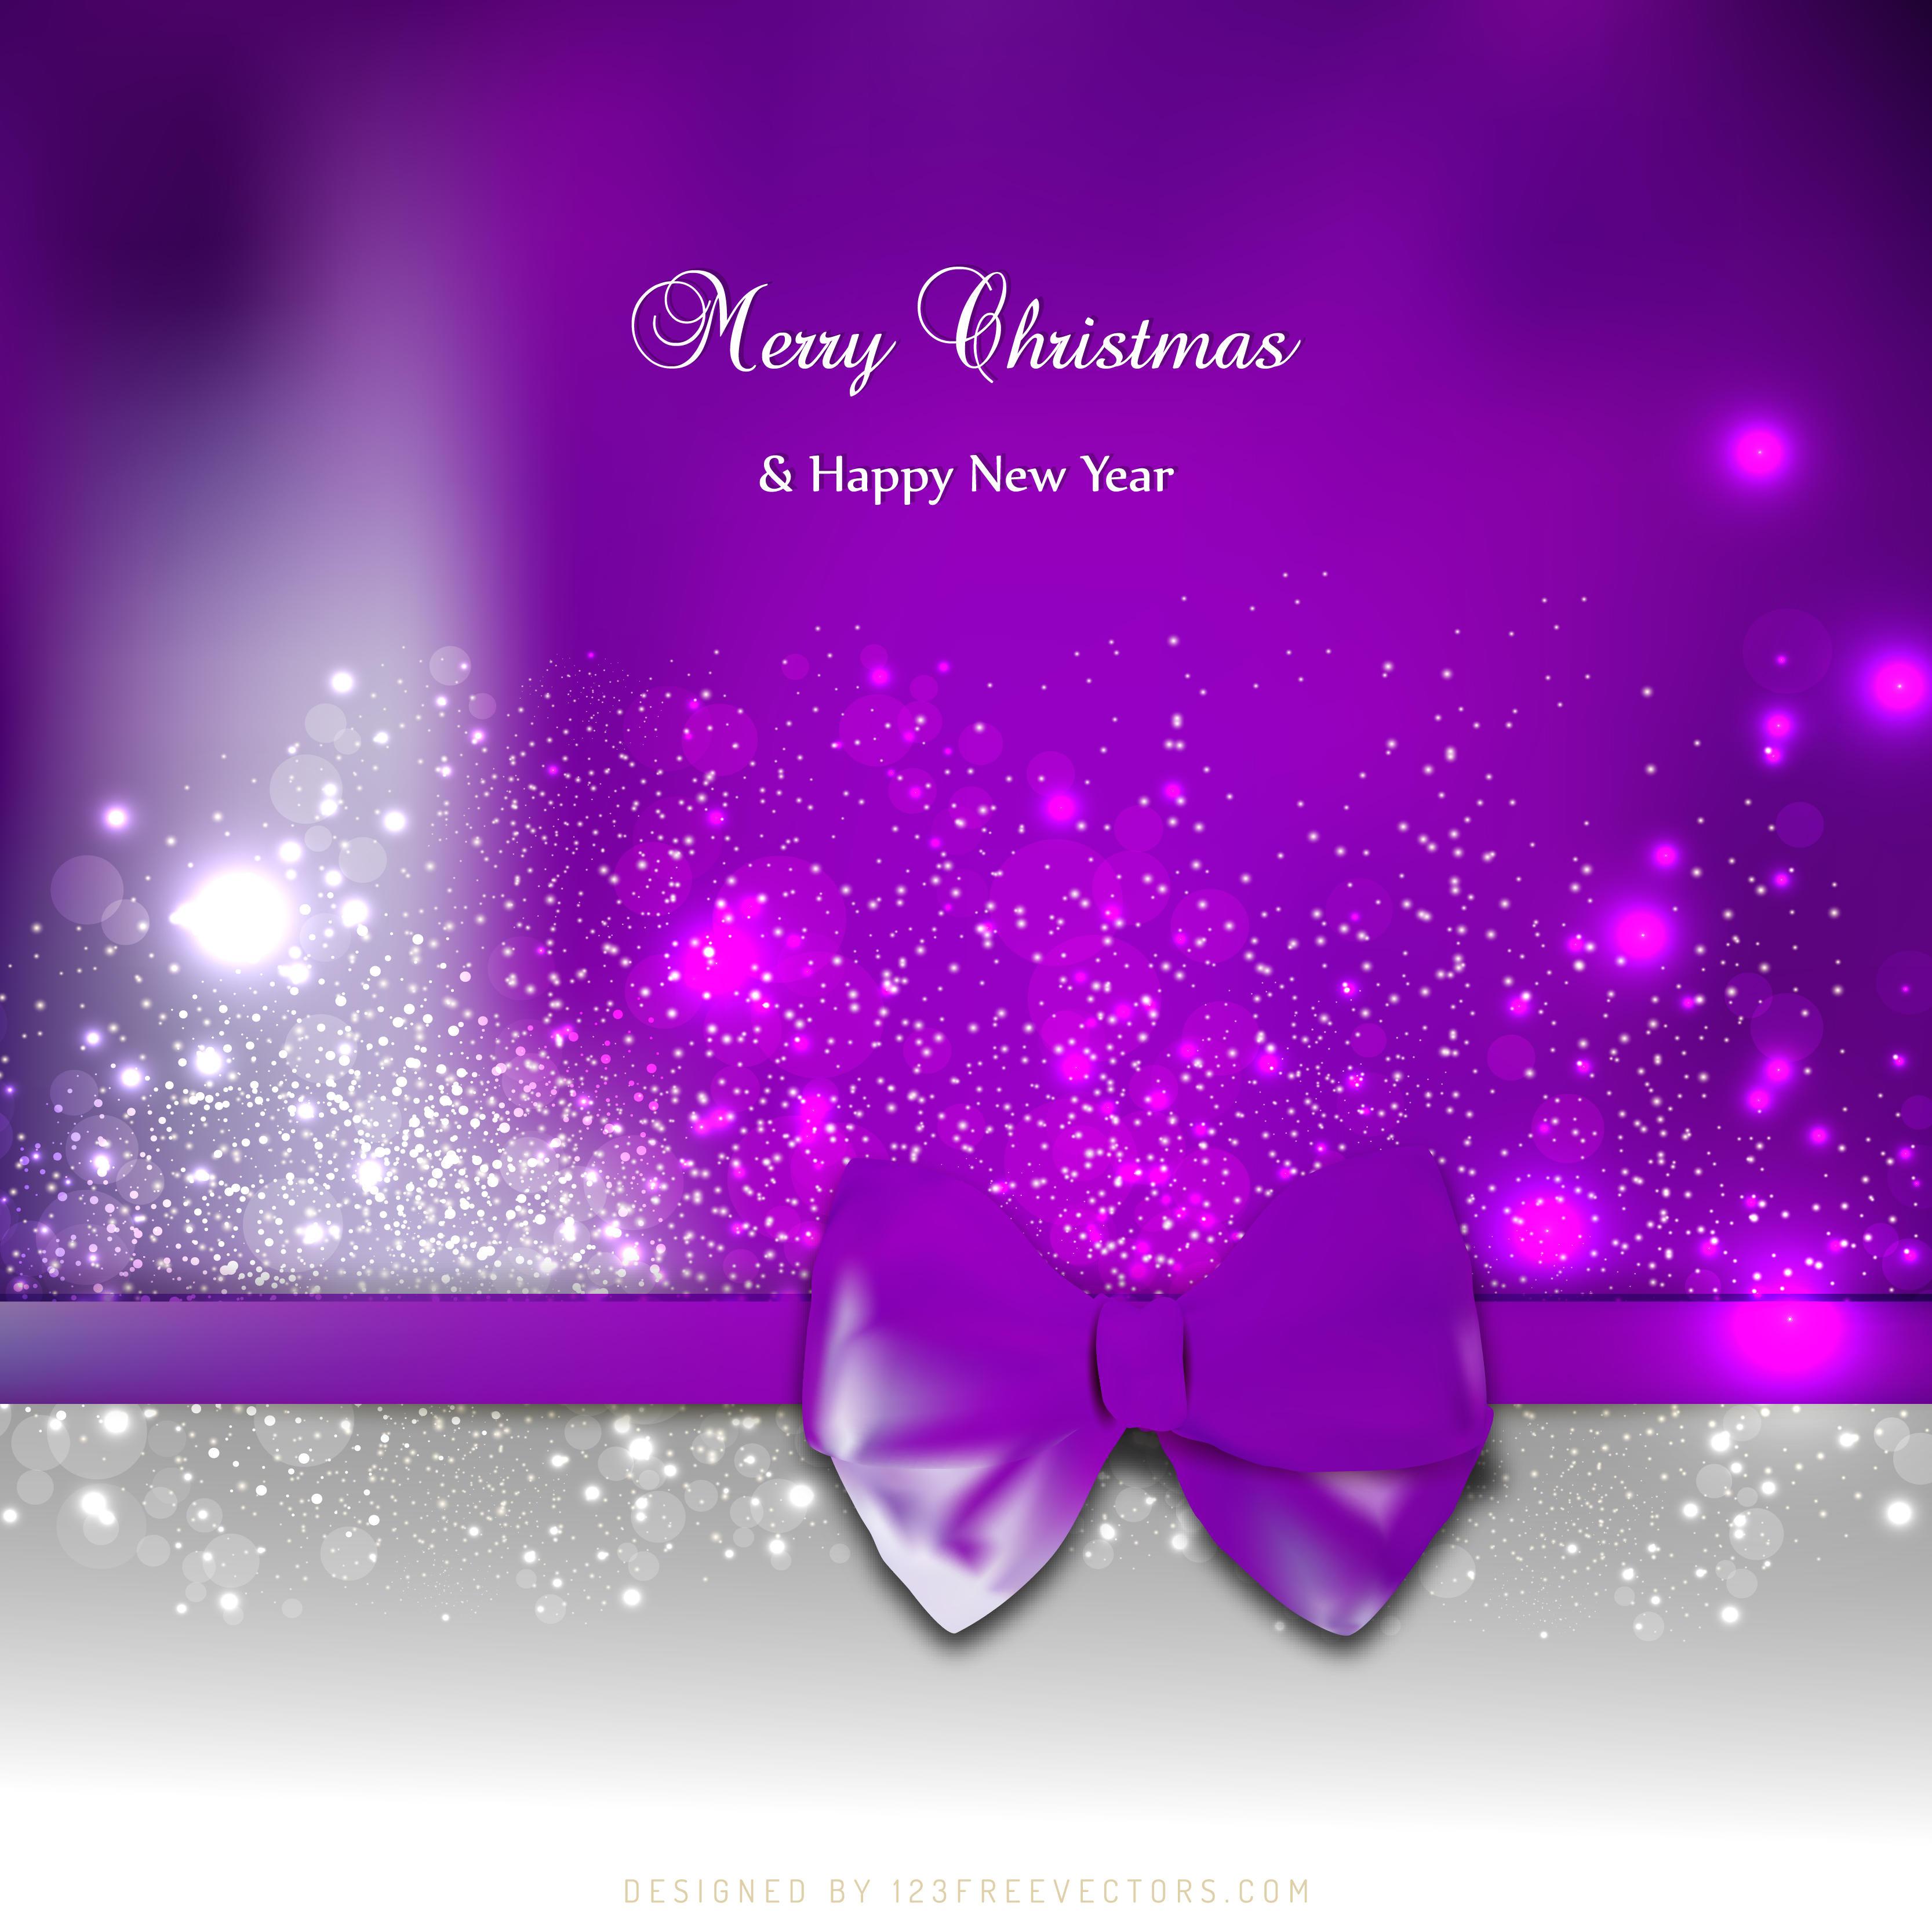 christmas sparkles purple background design 123freevectors